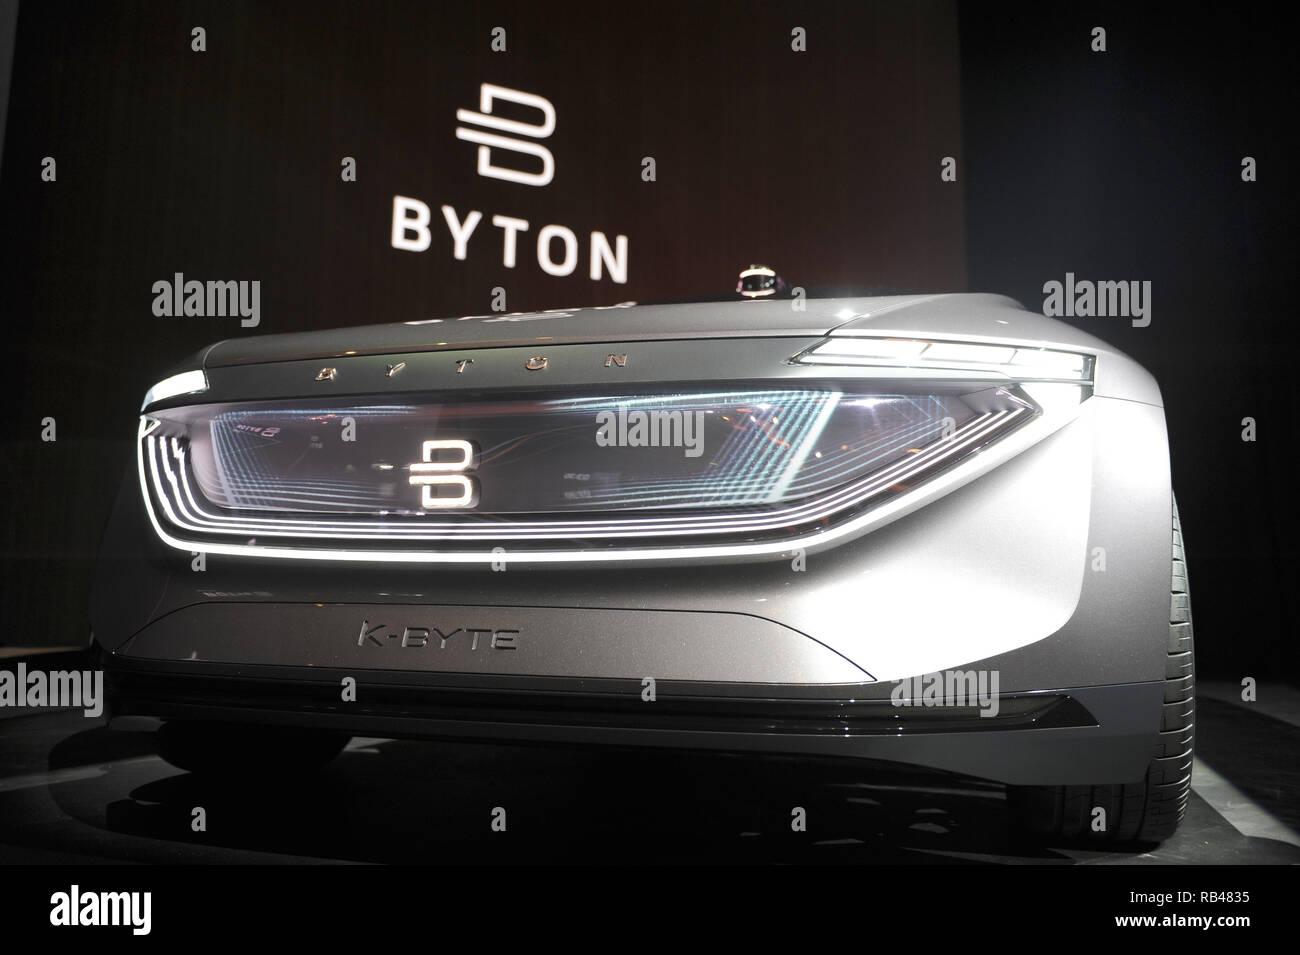 Las Vegas, USA  06th Jan, 2019  The concept car K-Byte of